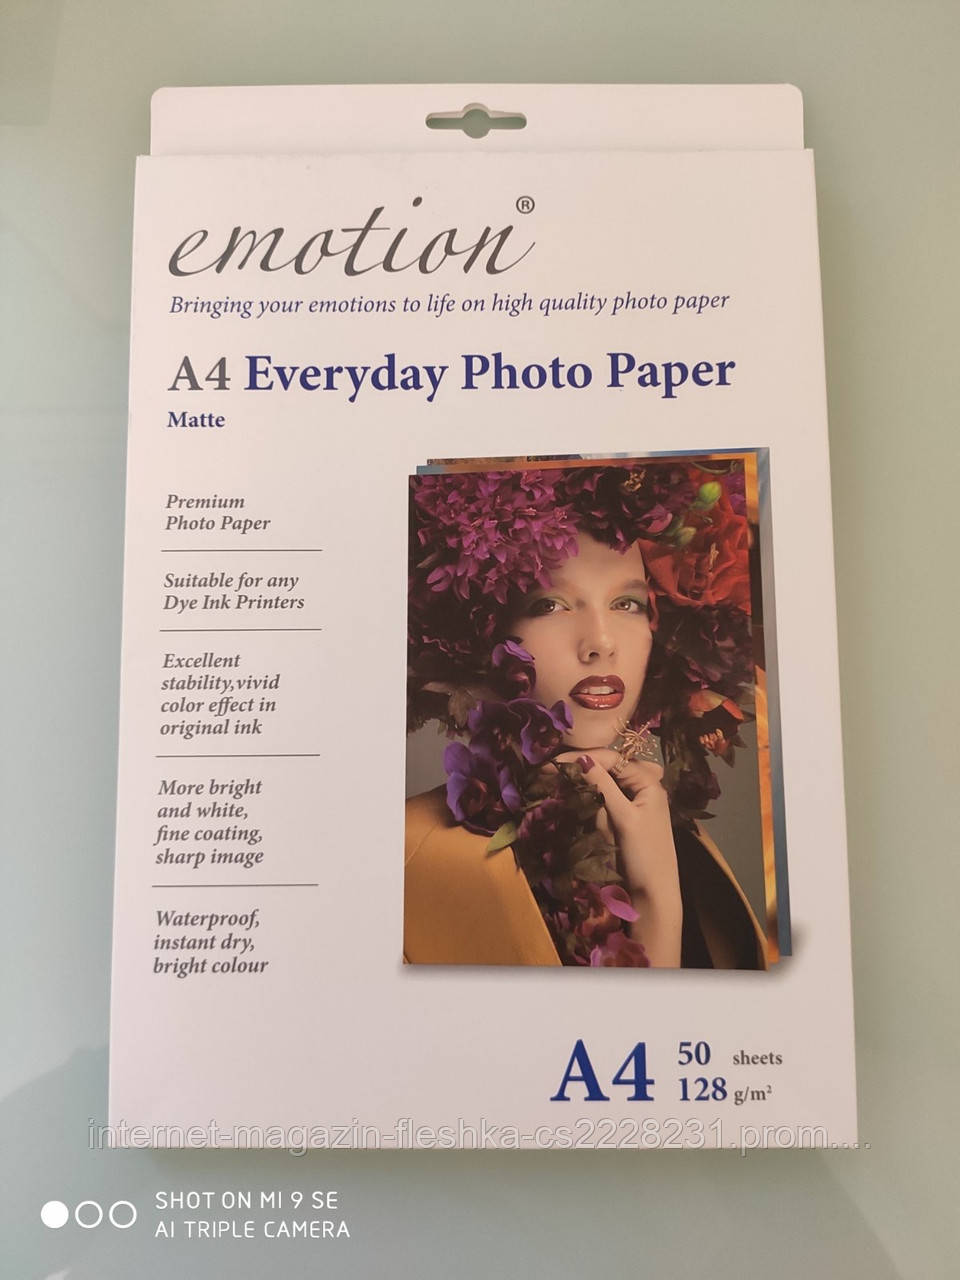 Бумага Emotion matte, Everyday 128g/m2, A4, 50л. (128G/M2/A4 50 PACK Matte)